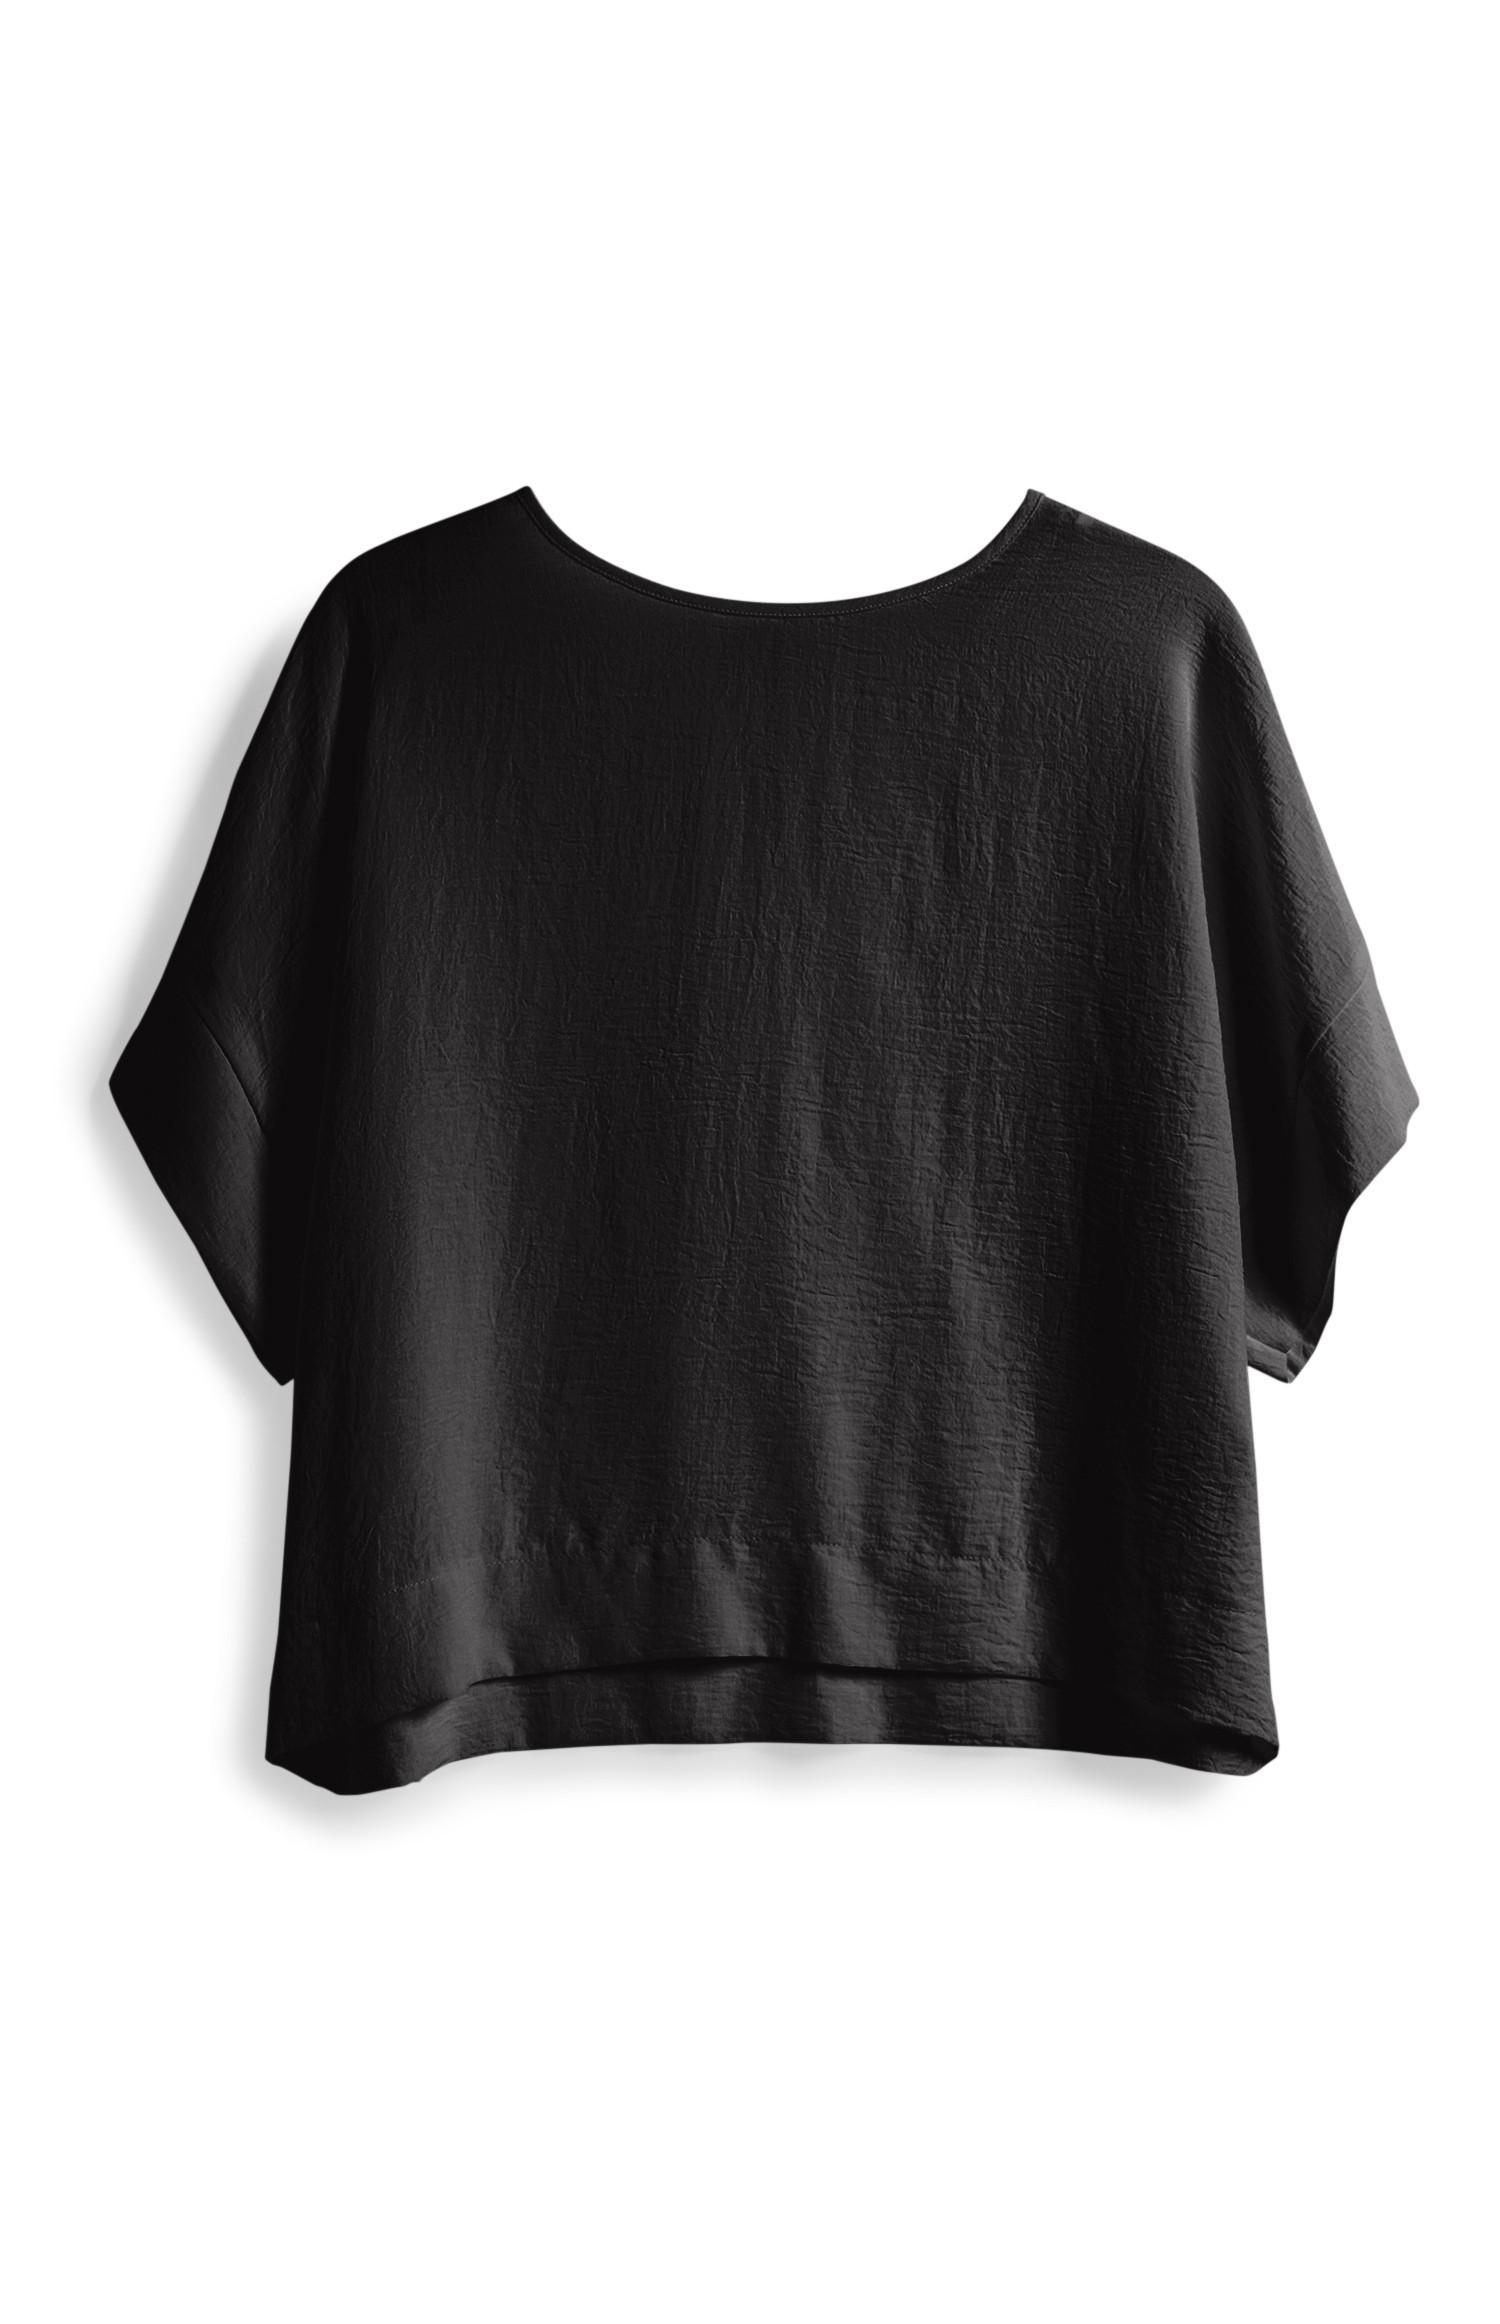 Kurzes T-Shirt in Schwarz